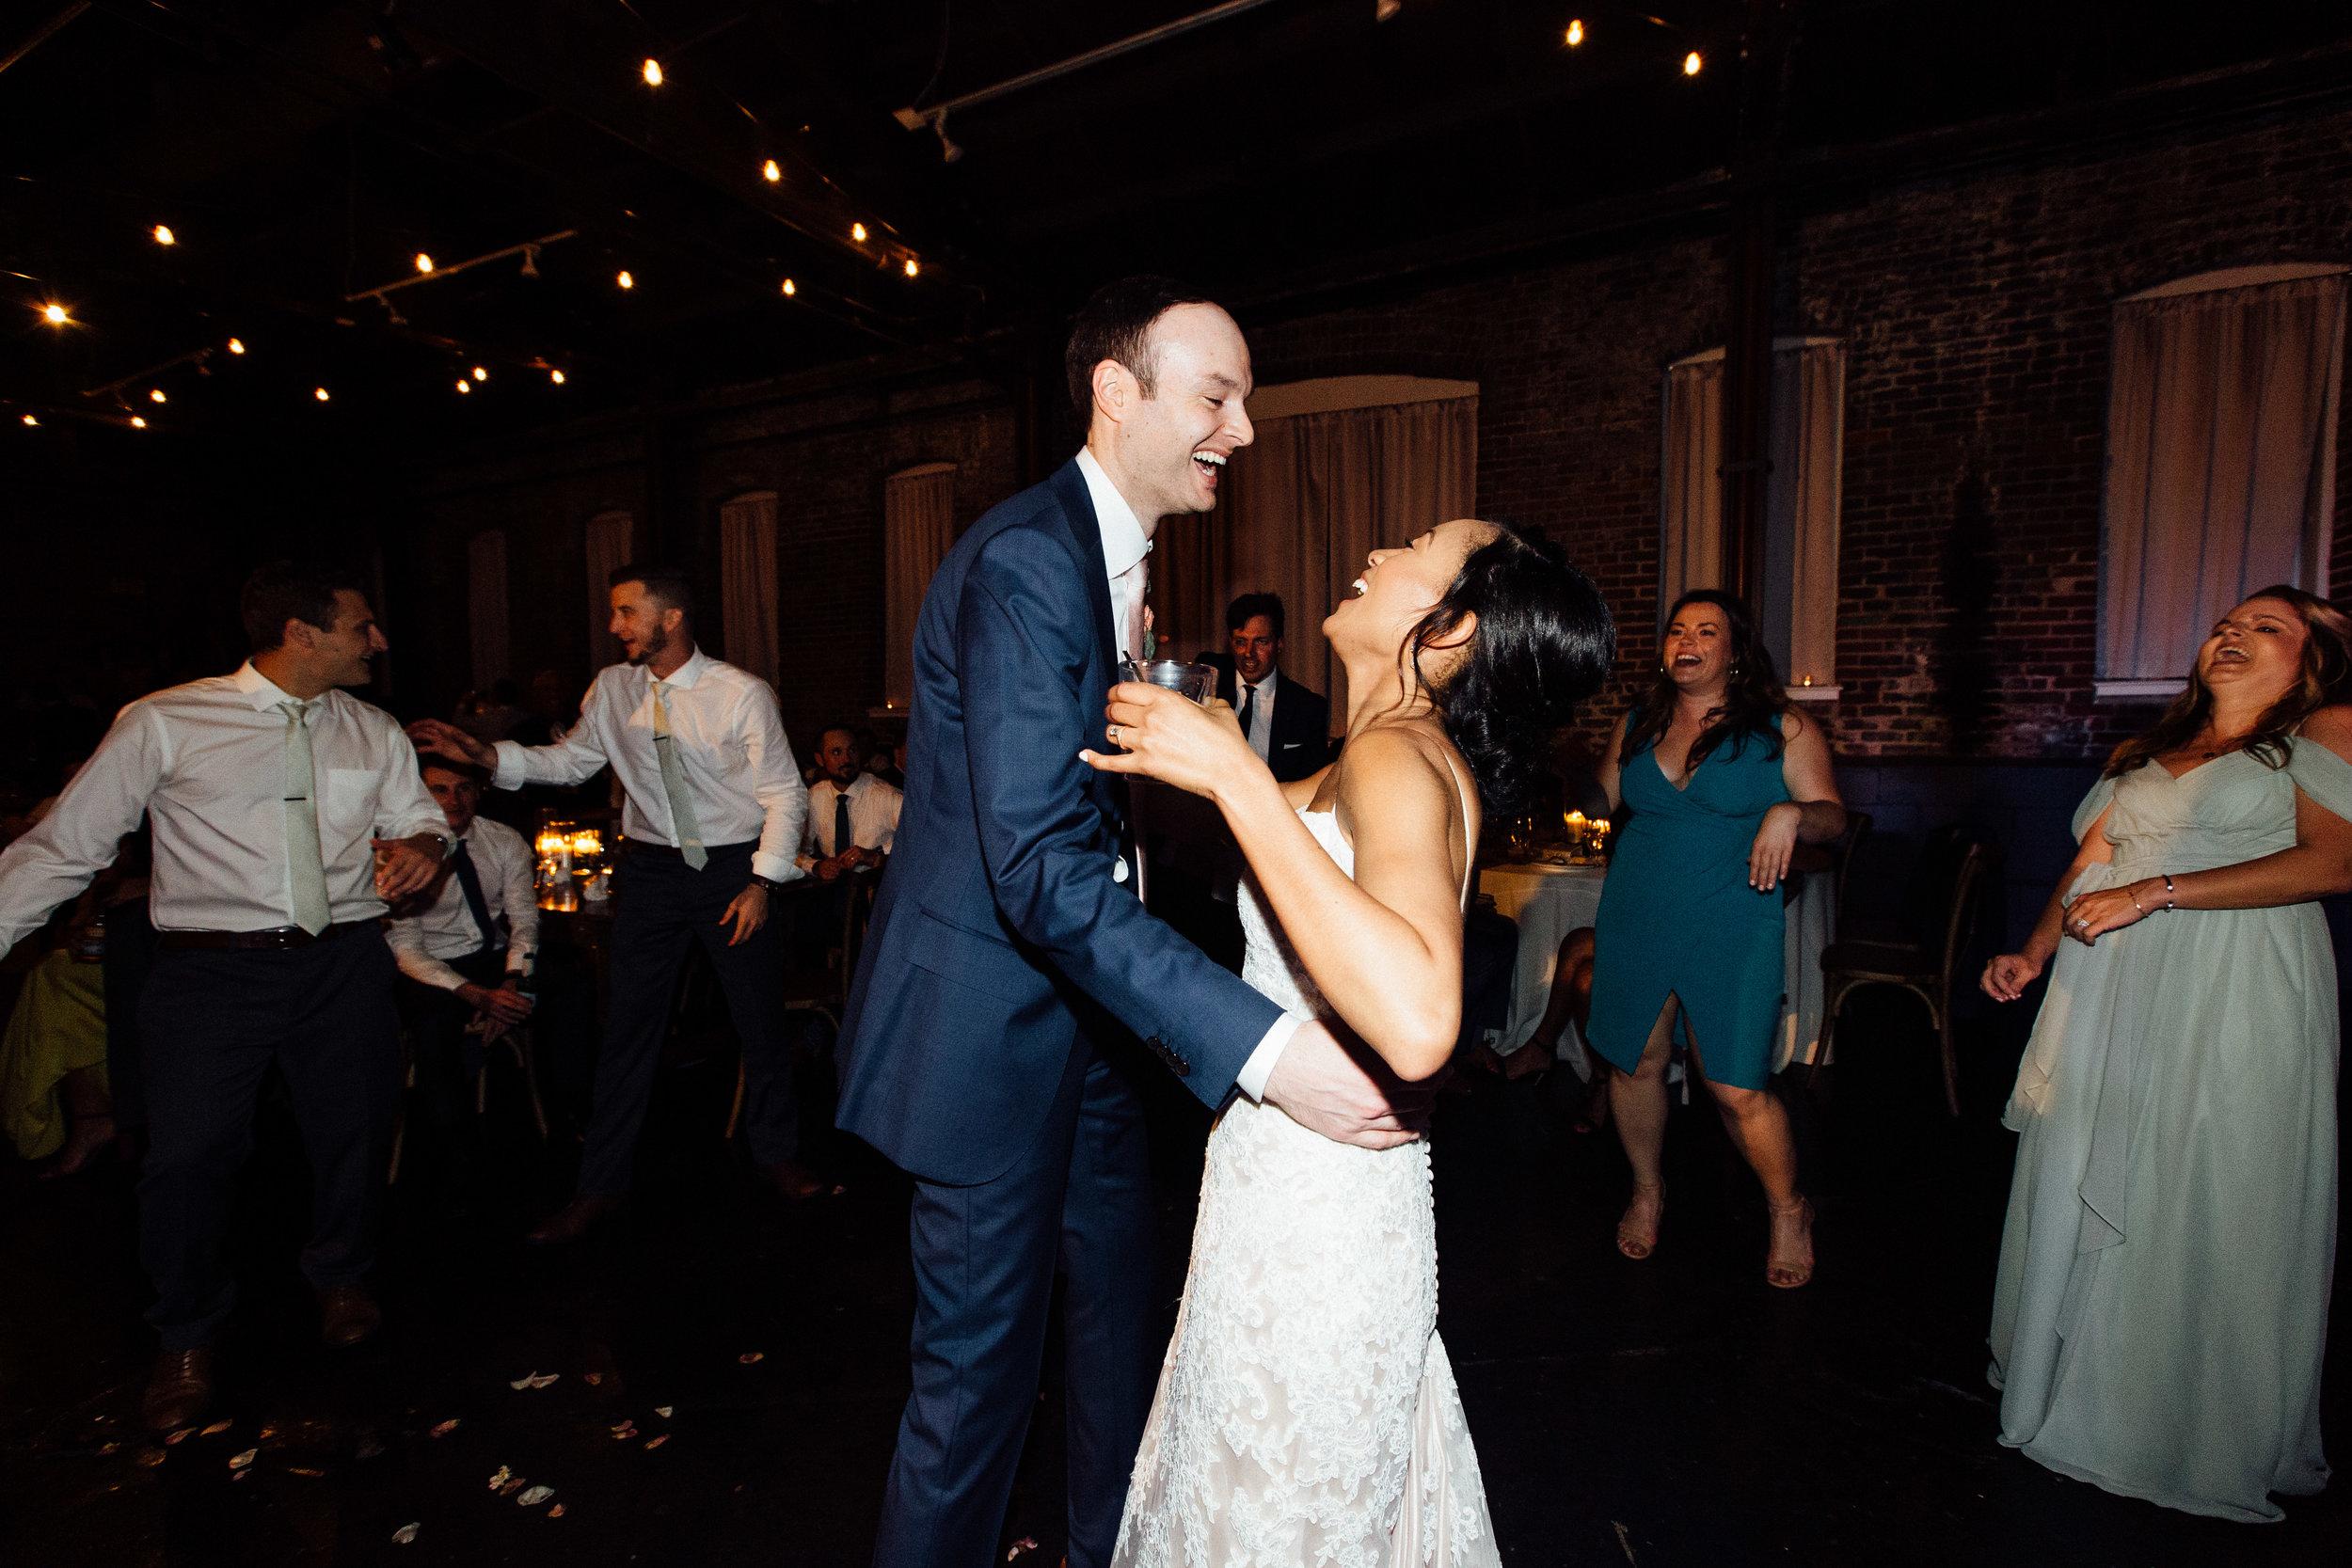 king_plow_atlanta_wedding_art_gallery_modern_lifestyle_documentary_2041.jpg